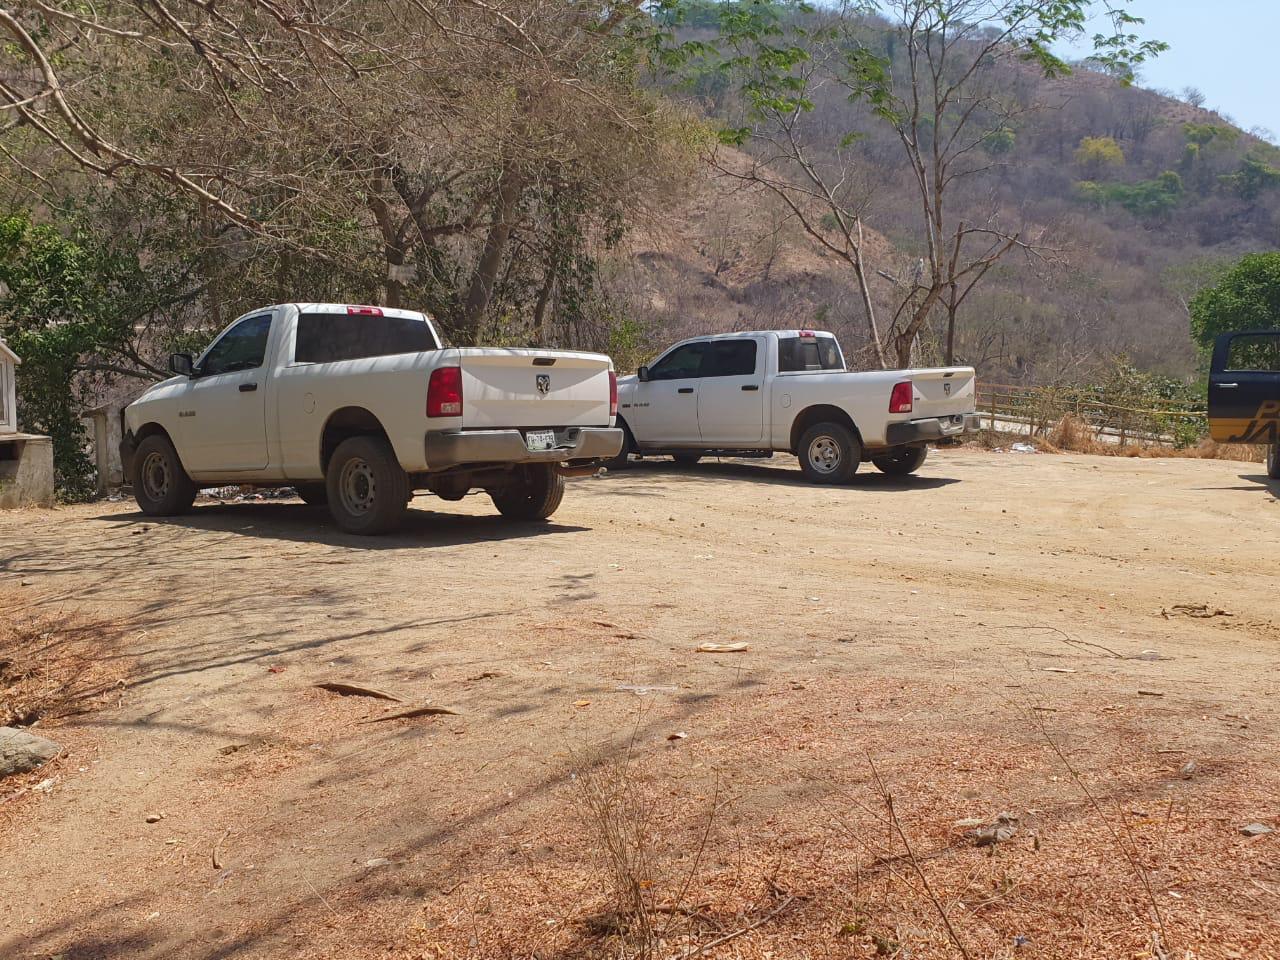 Liberan a 3 de 10 agentes de Colima desaparecidos en Jalisco